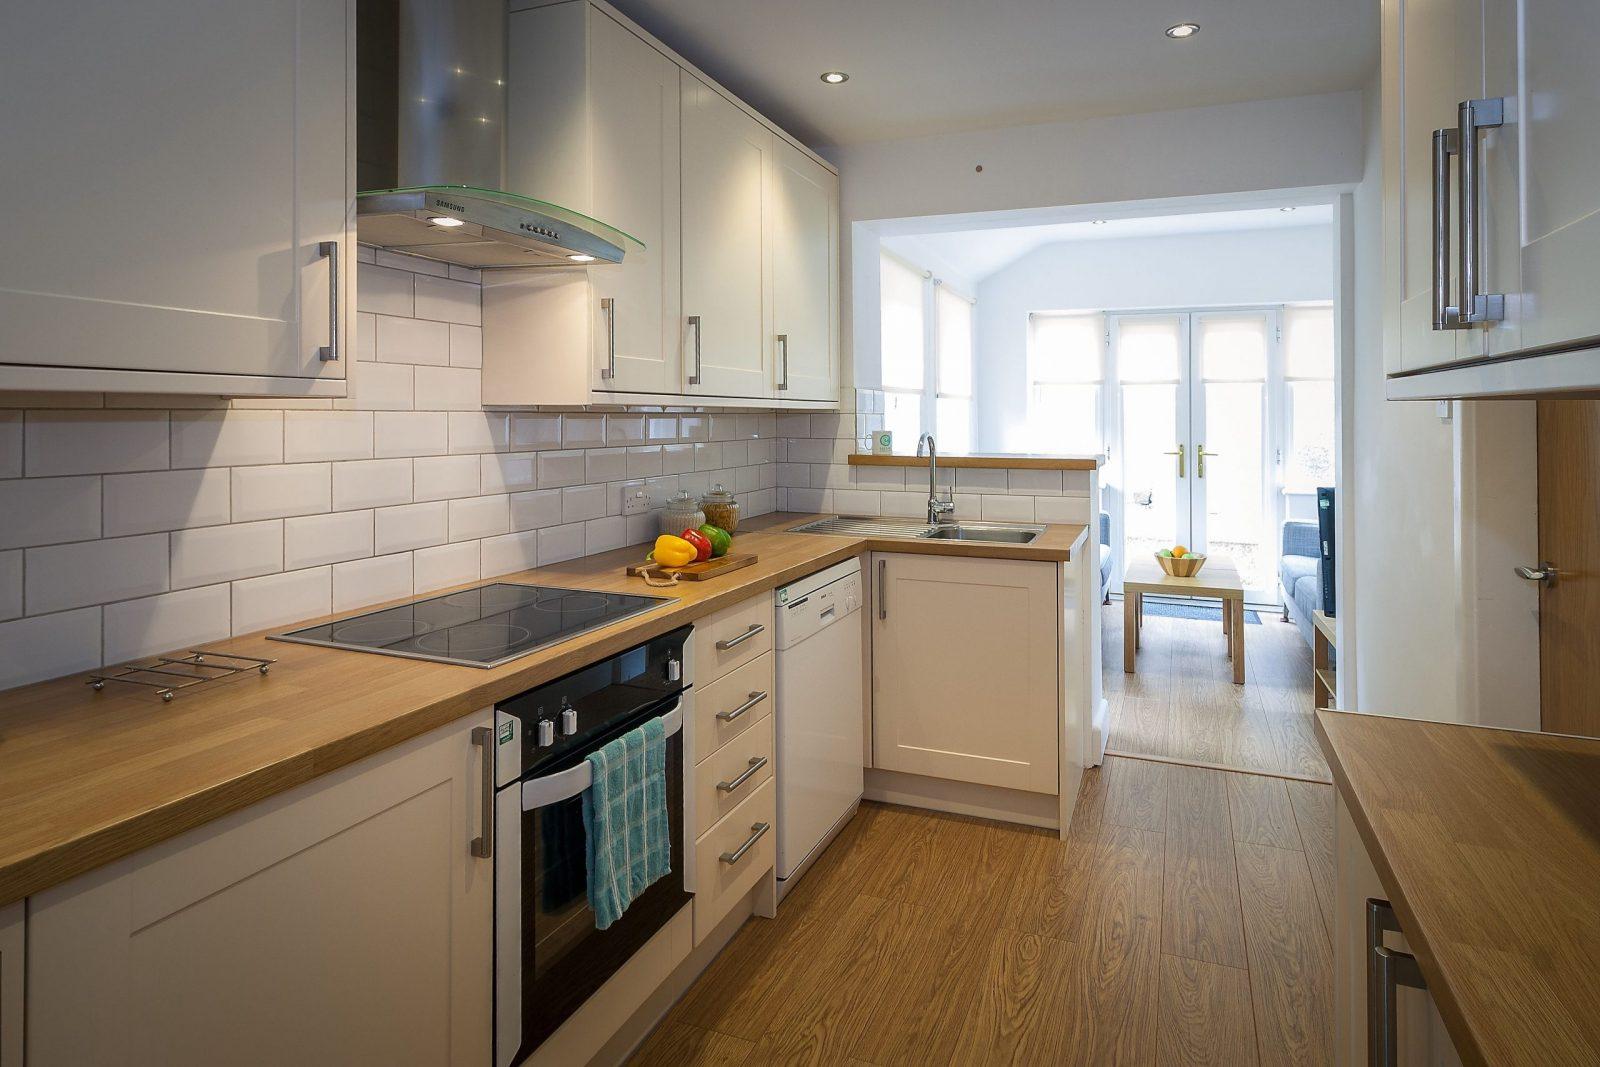 20 Anthony Road Lancaster 4 bedroom student house kitchen 01